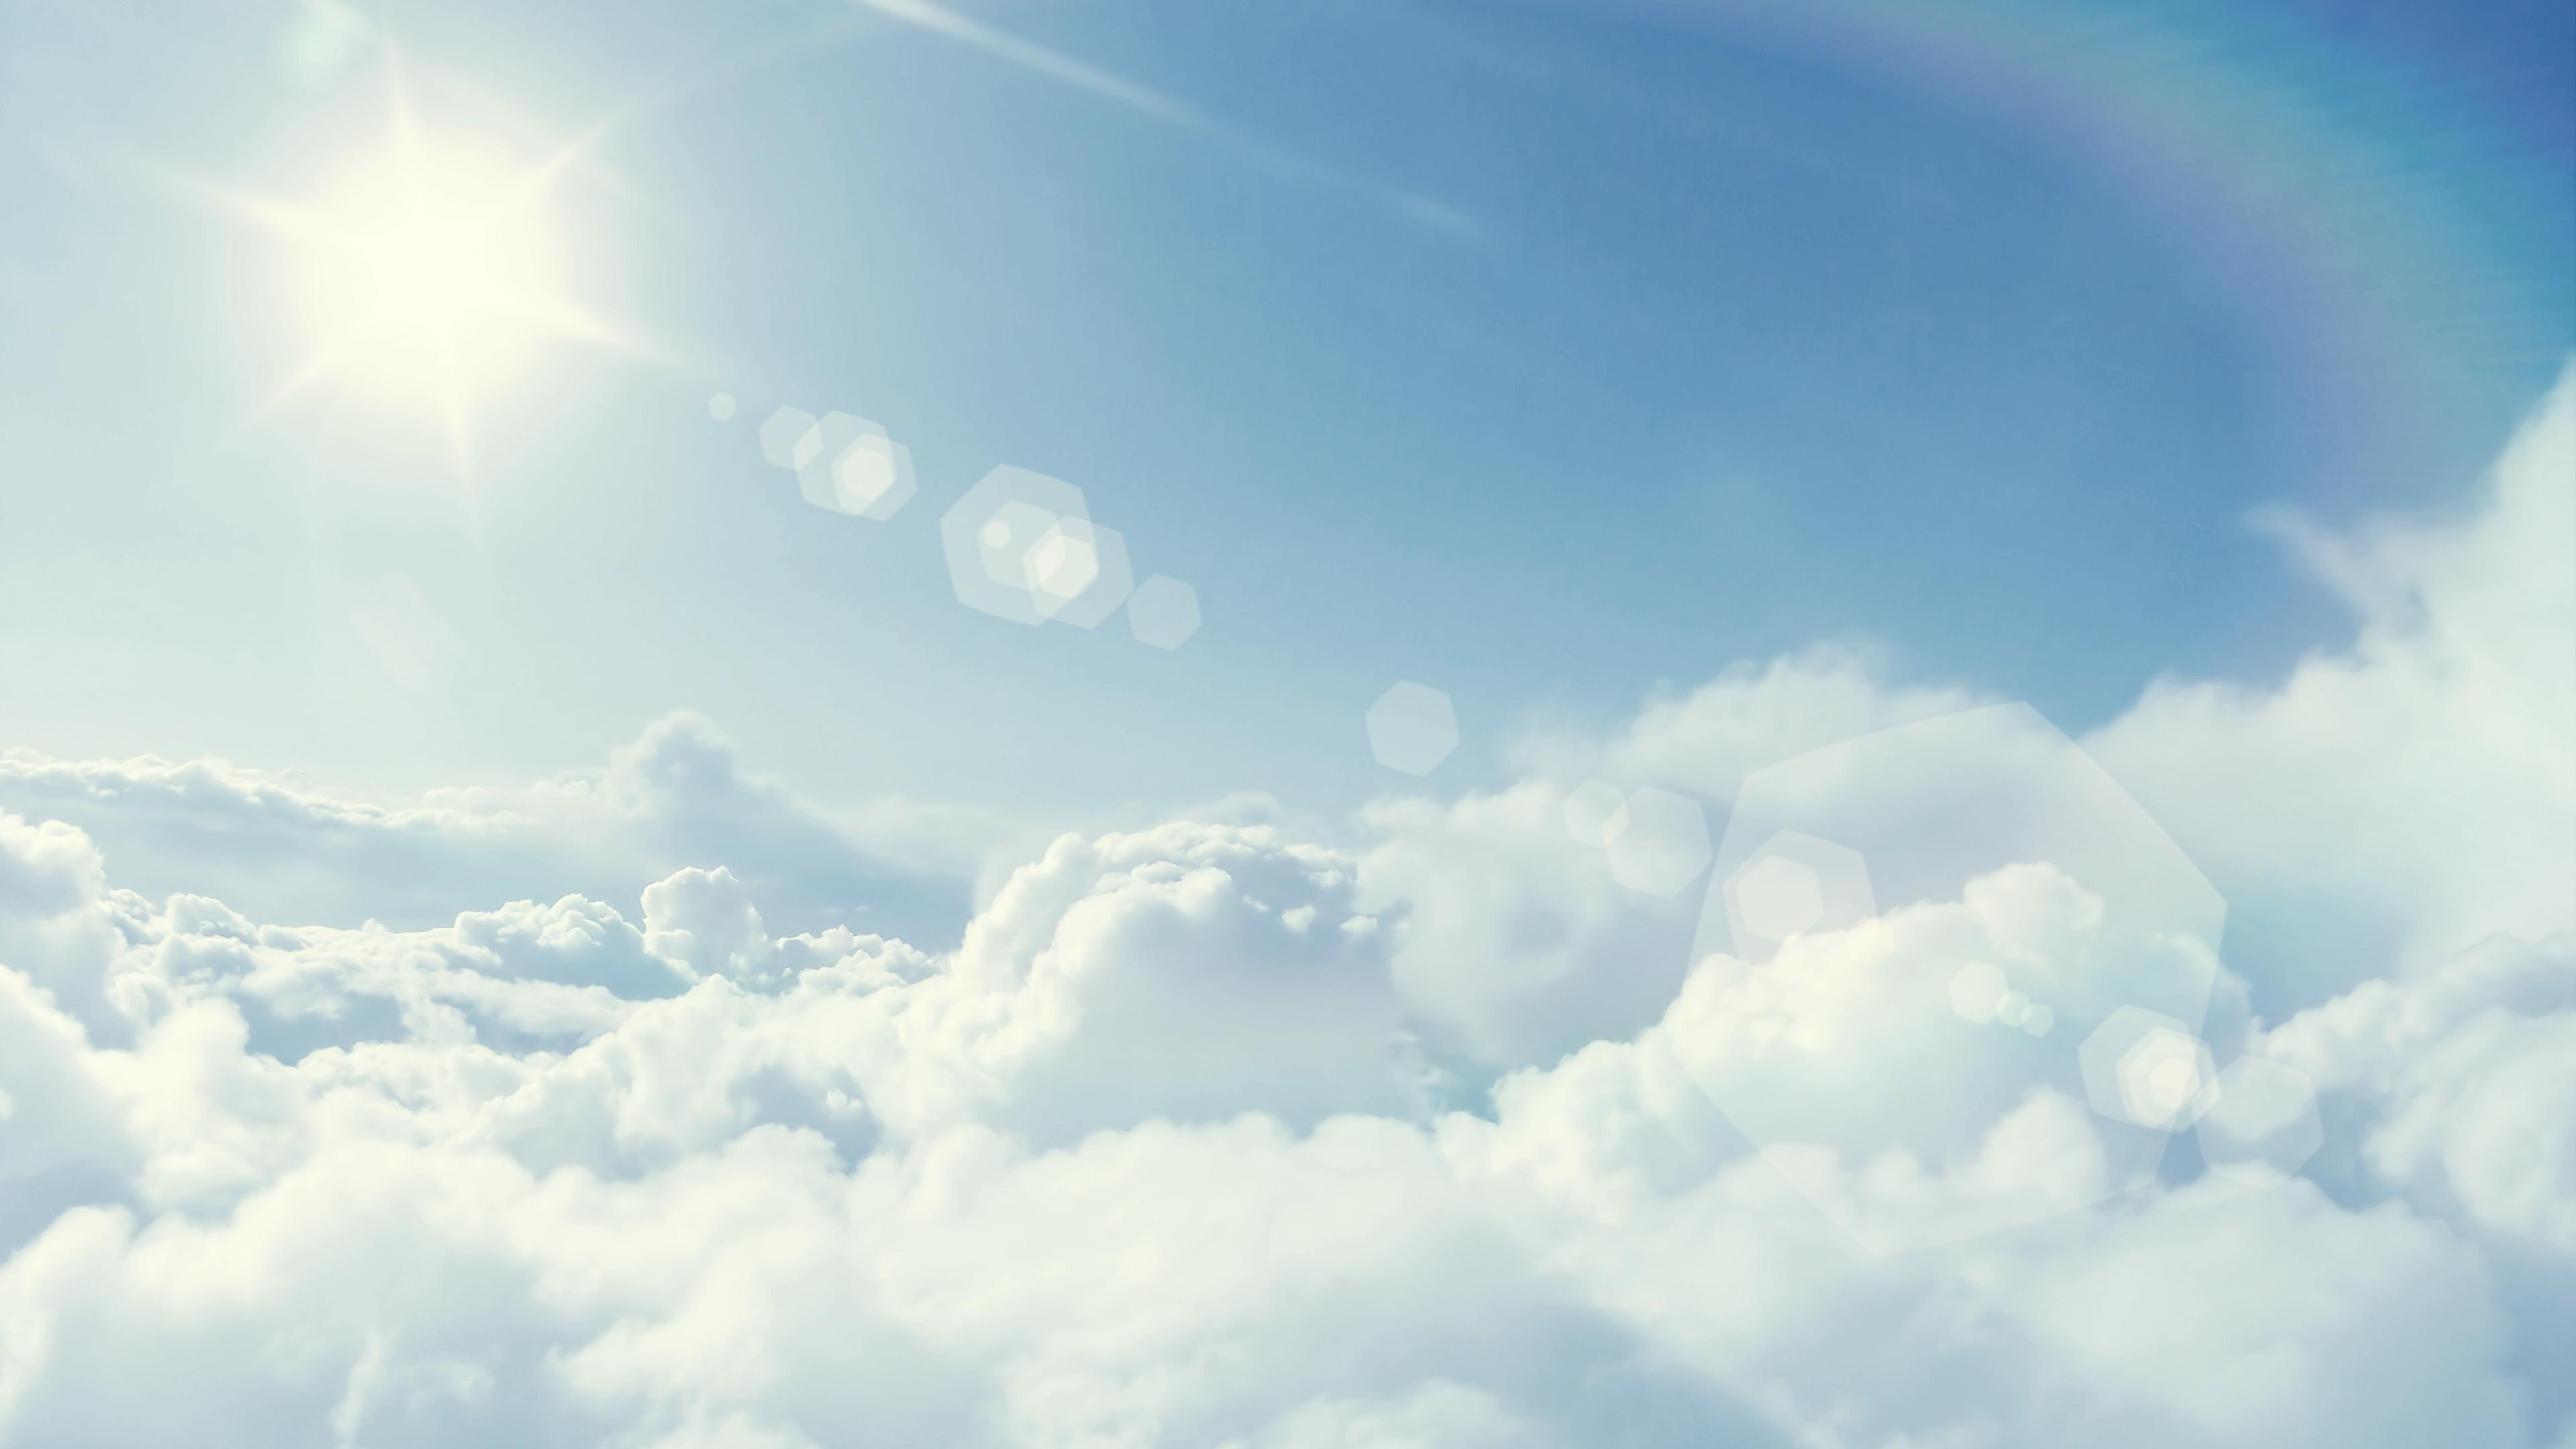 Best Of Heaven Wallpaper Heaven Wallpaper Sun And Clouds Clouds